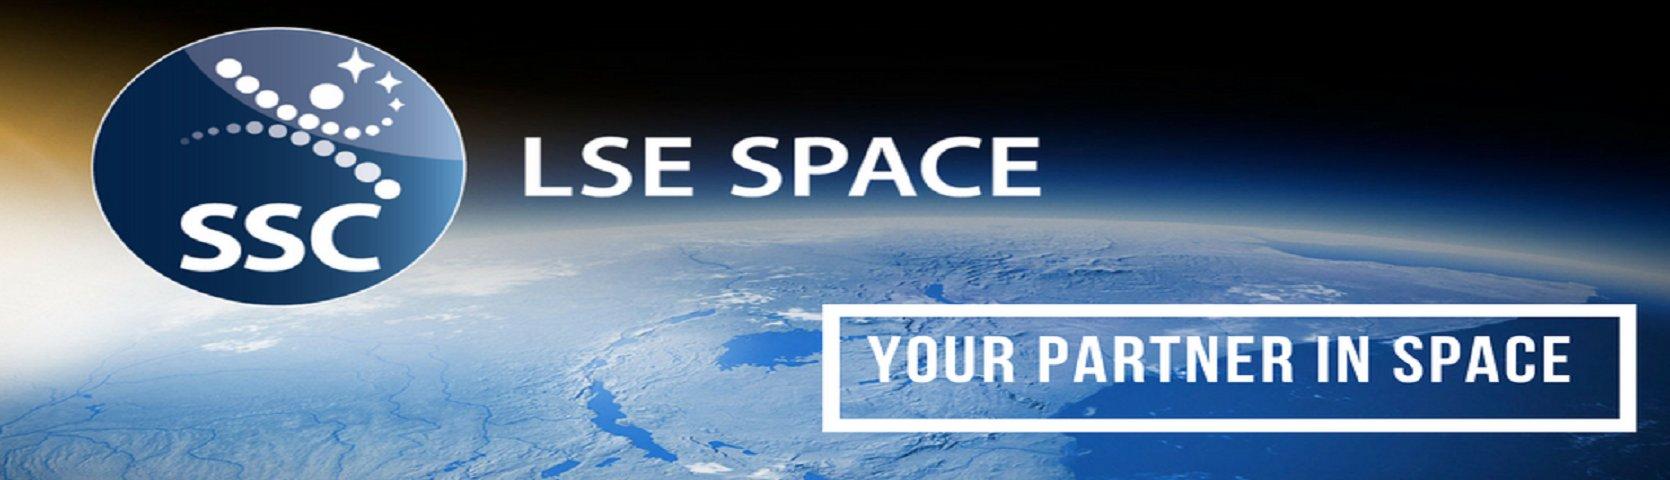 LSE Space GmbH